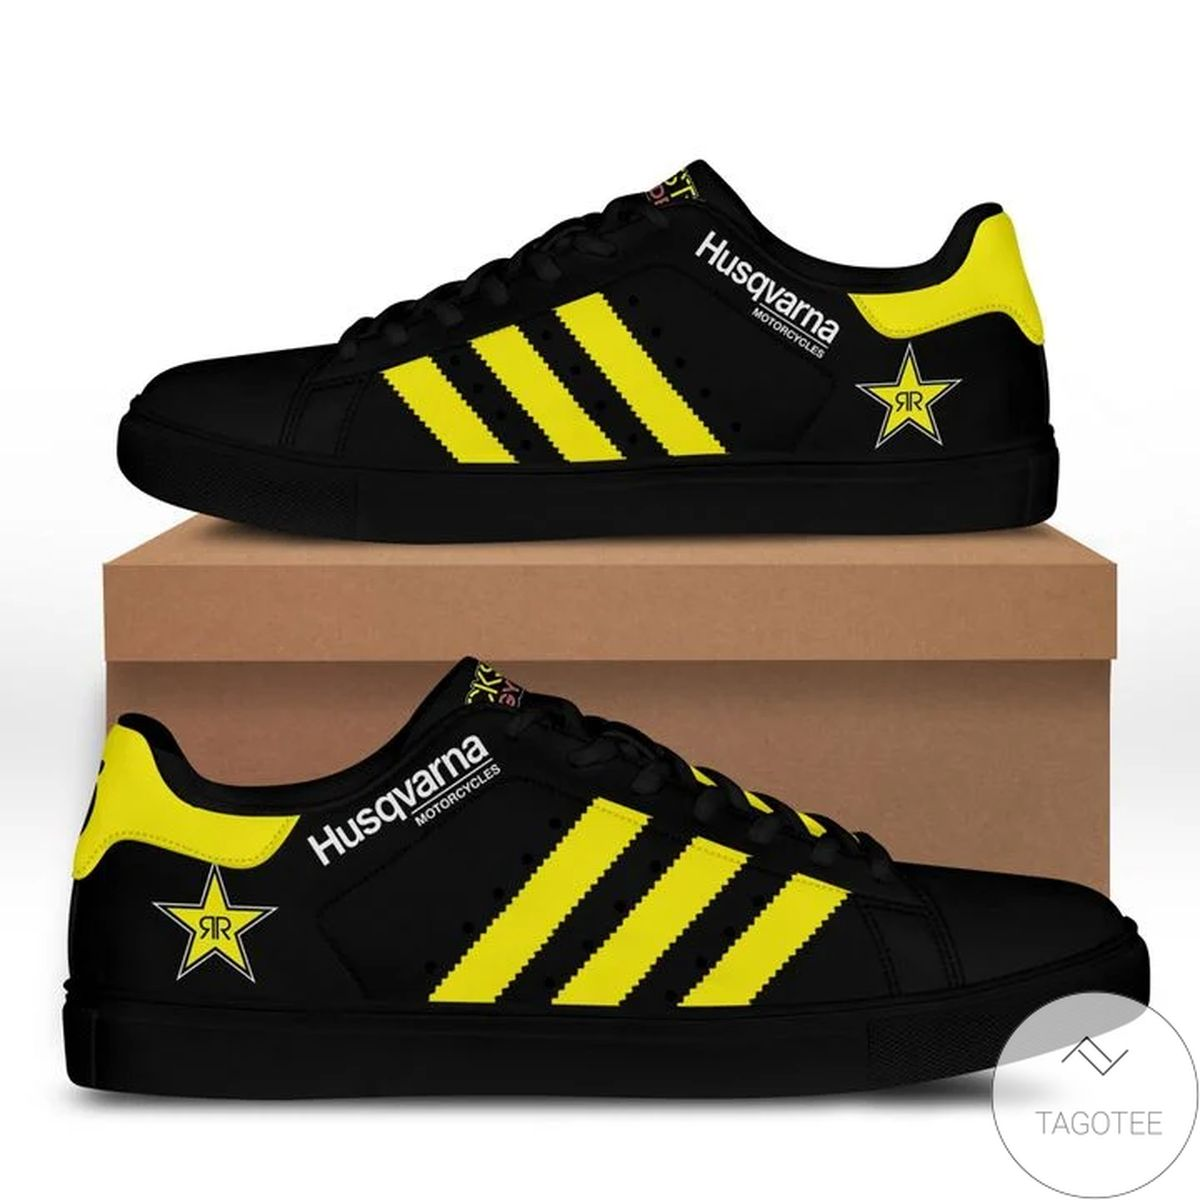 Husqvarna Racing Stan Smith Shoes